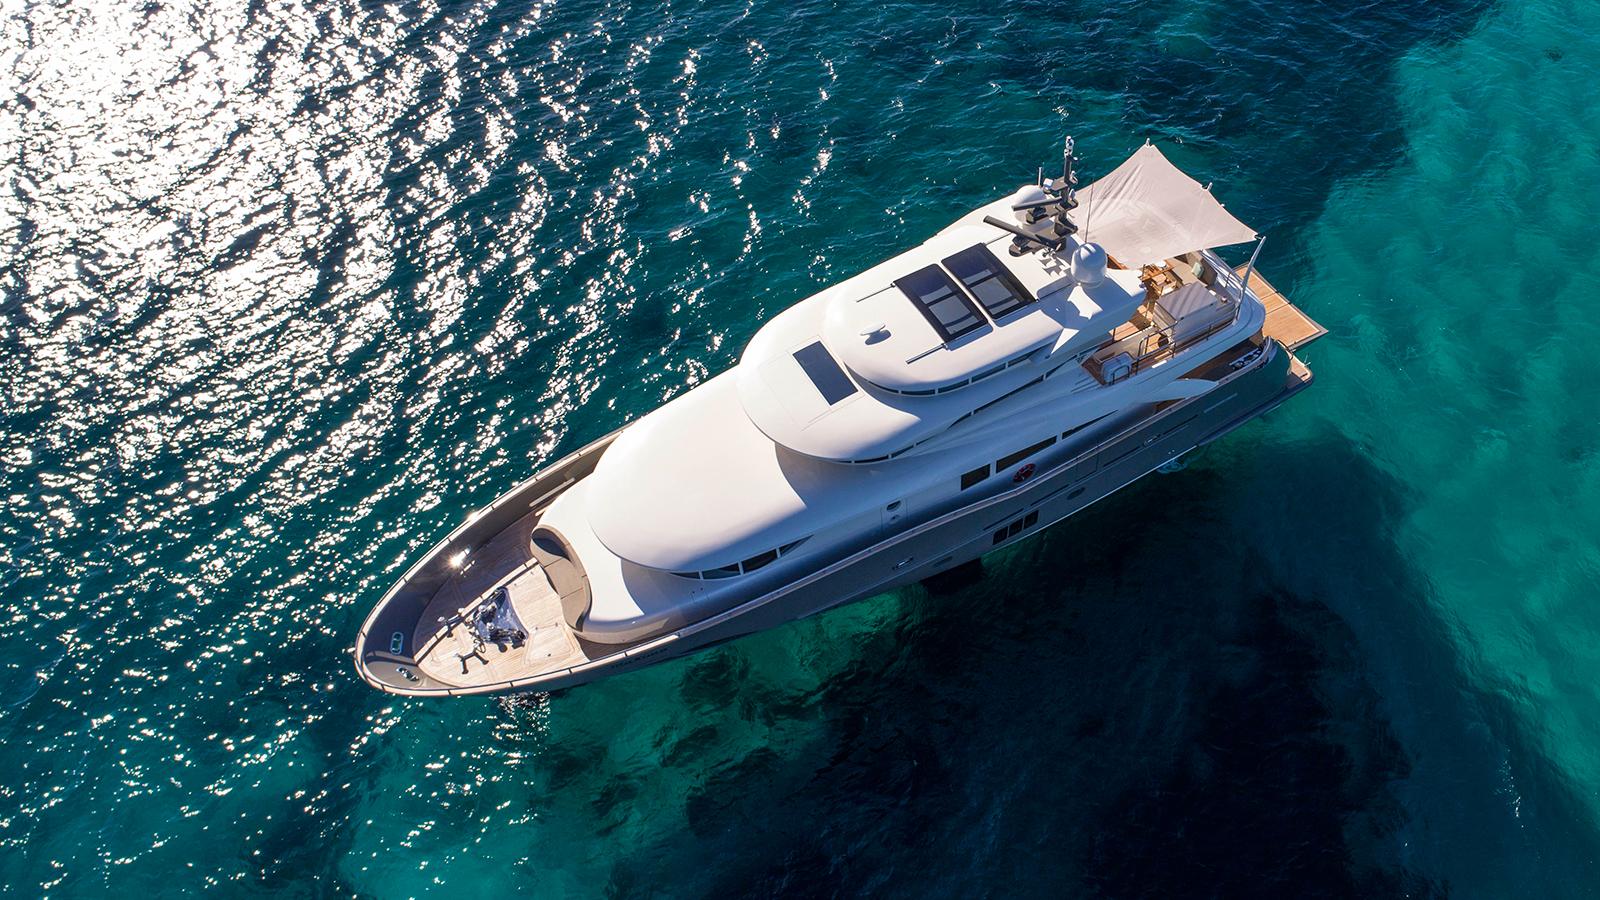 aerial-view-of-the-filippetti-navetta-26-yacht-maxima